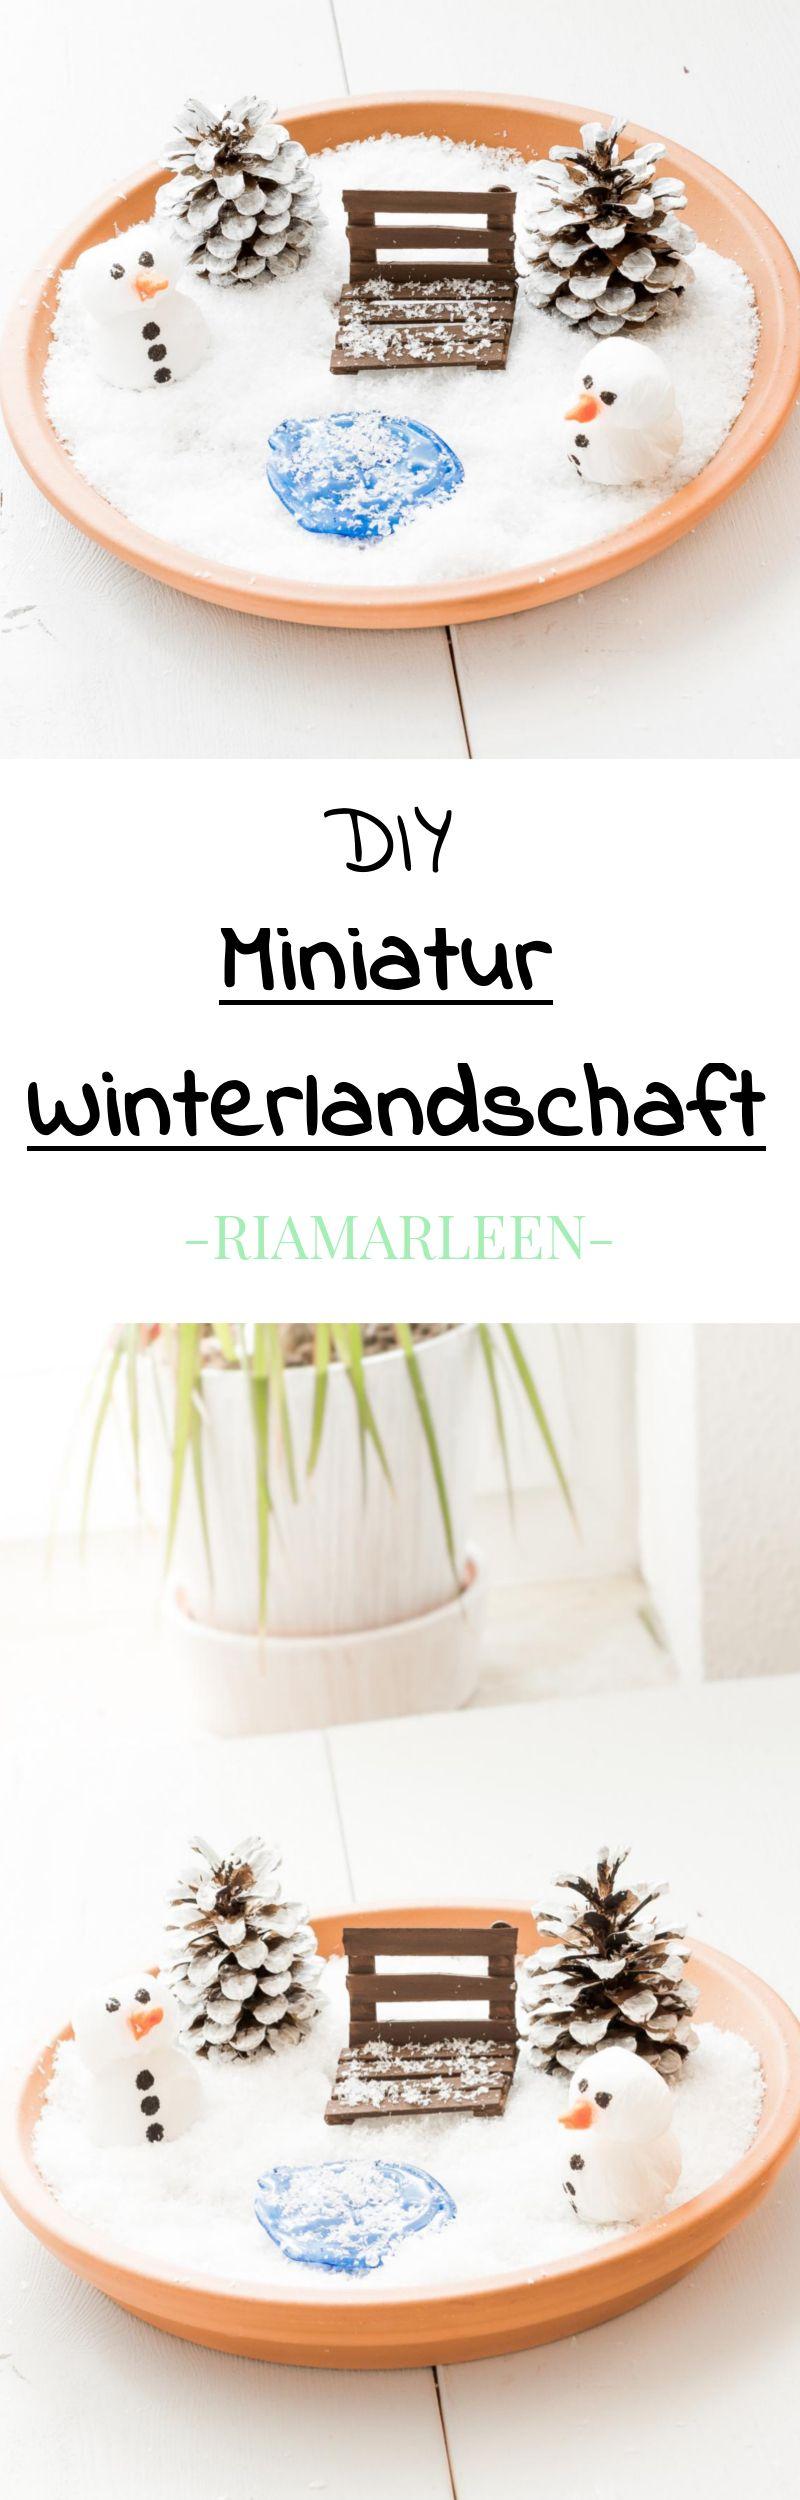 Sch ne winterdeko diy miniatur winterlandschaft basteln - Winterlandschaft deko ...